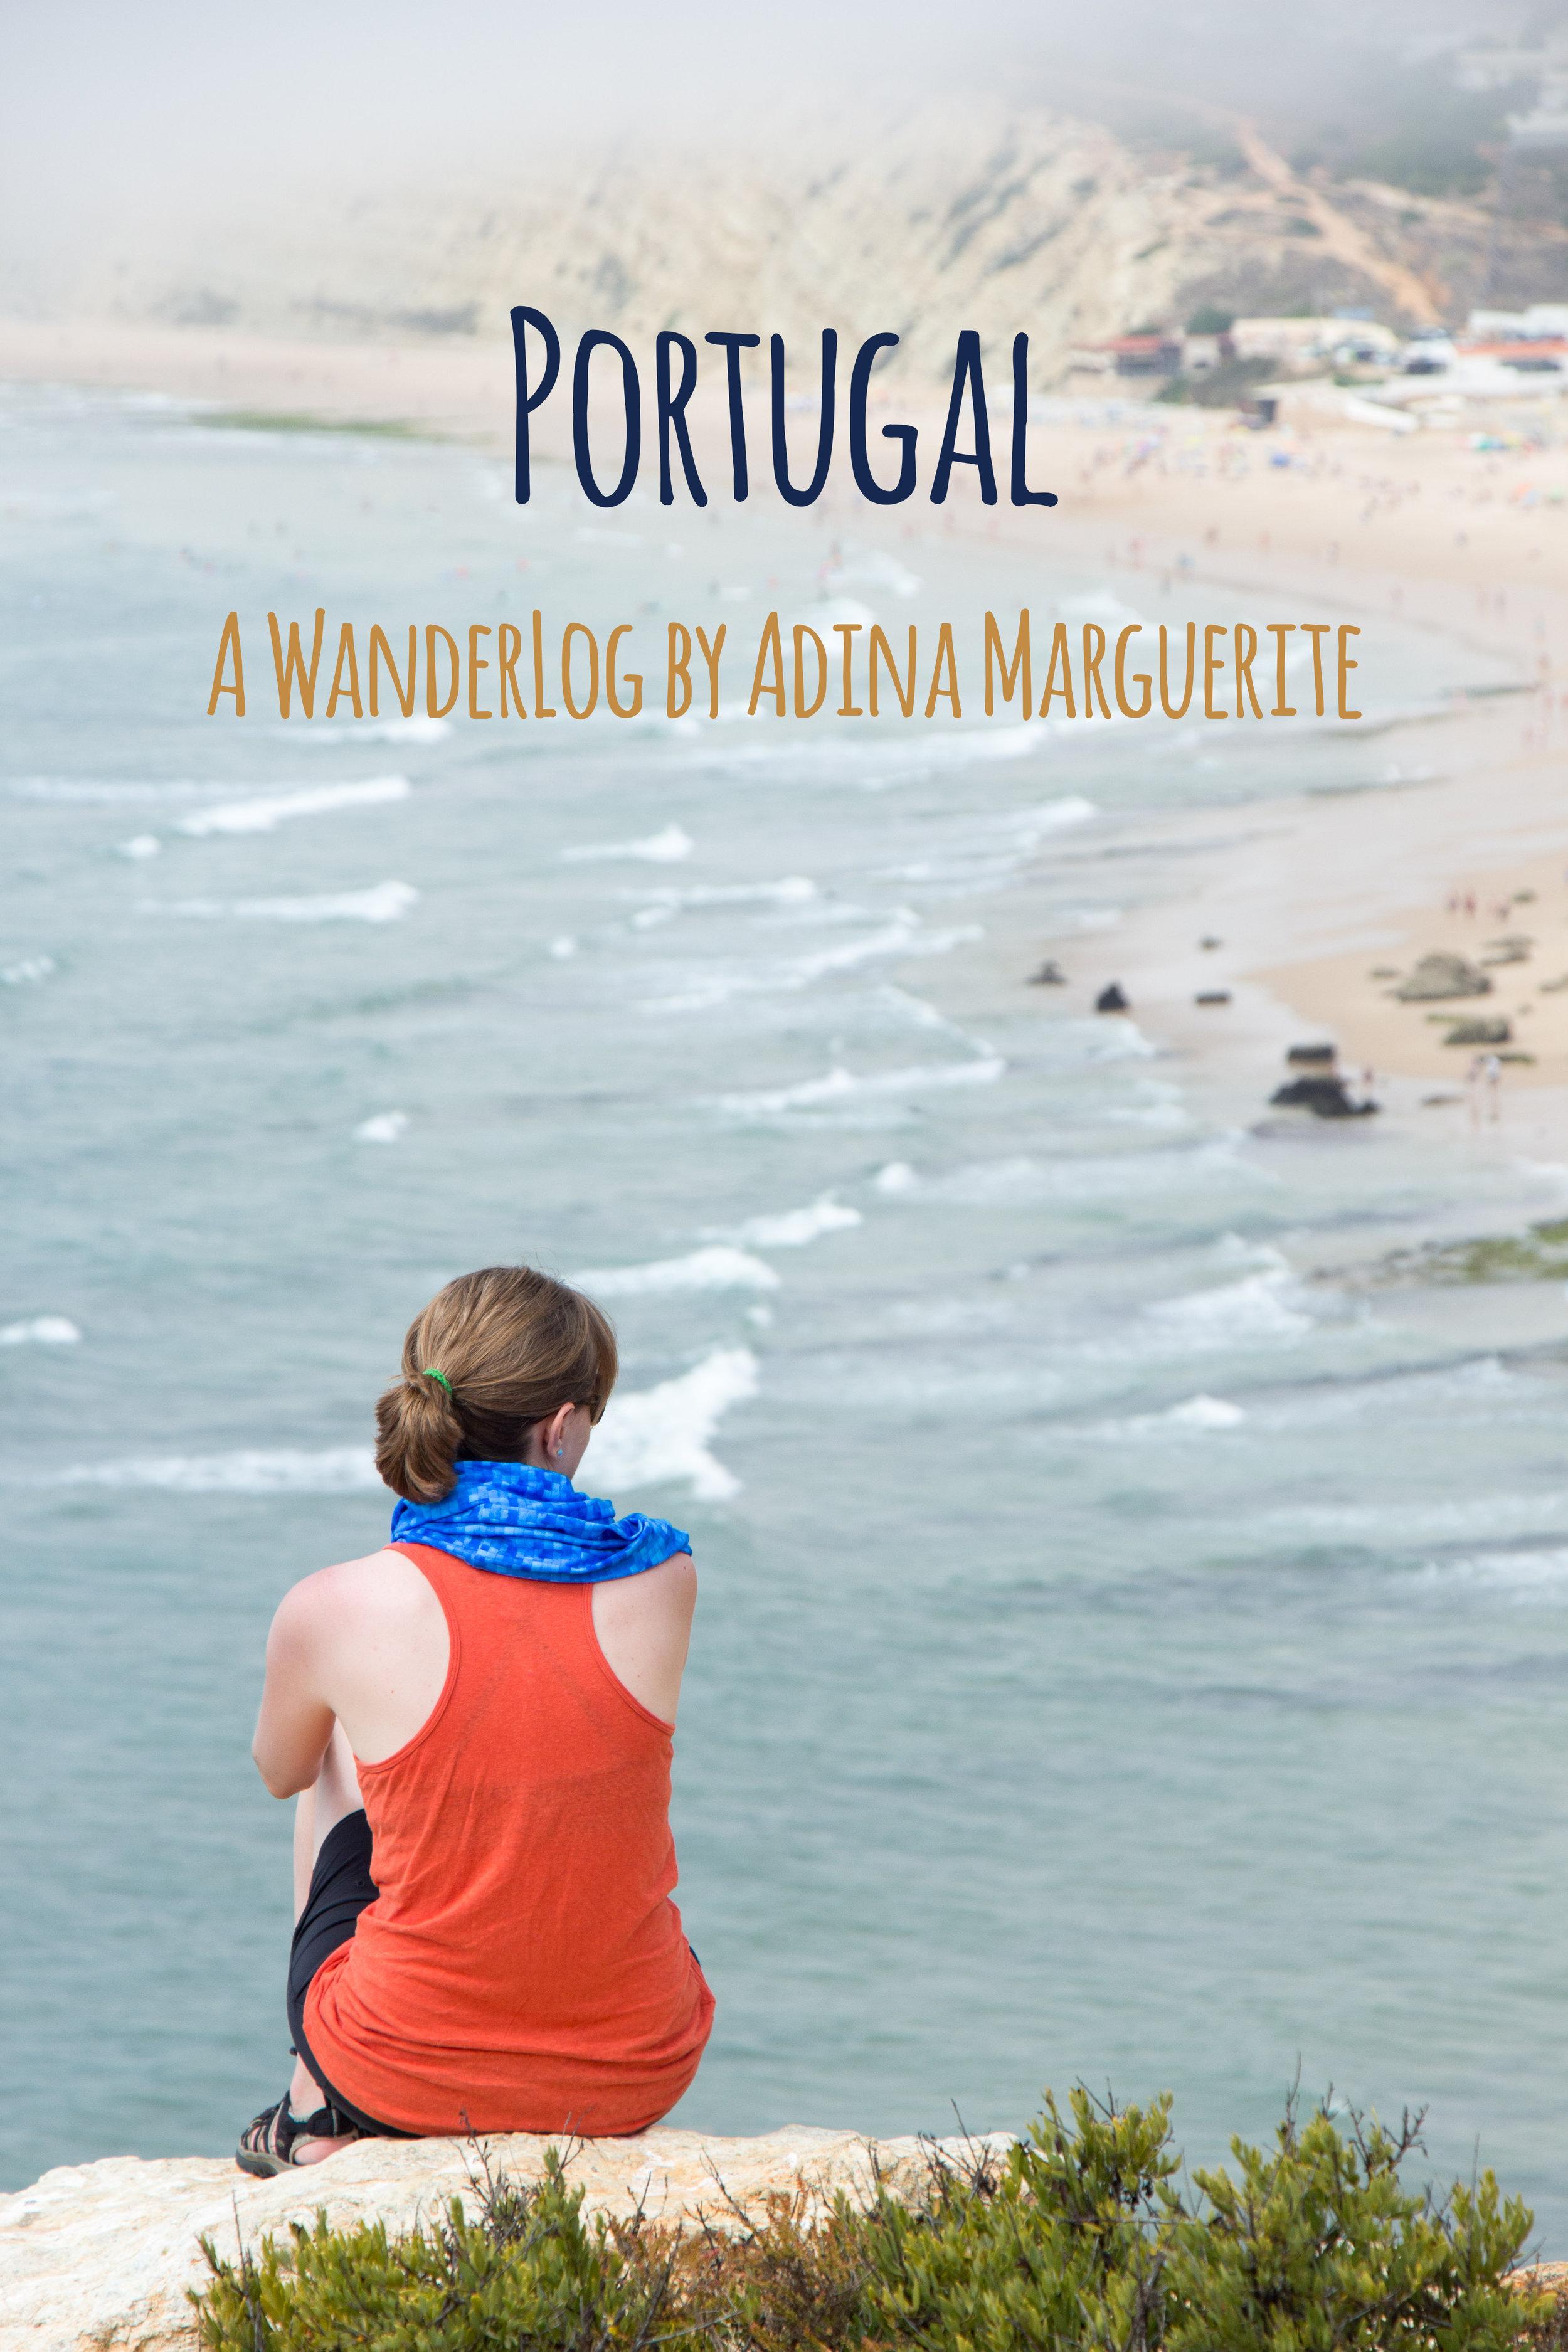 Wander Log: Portugal by Adina Marguerite